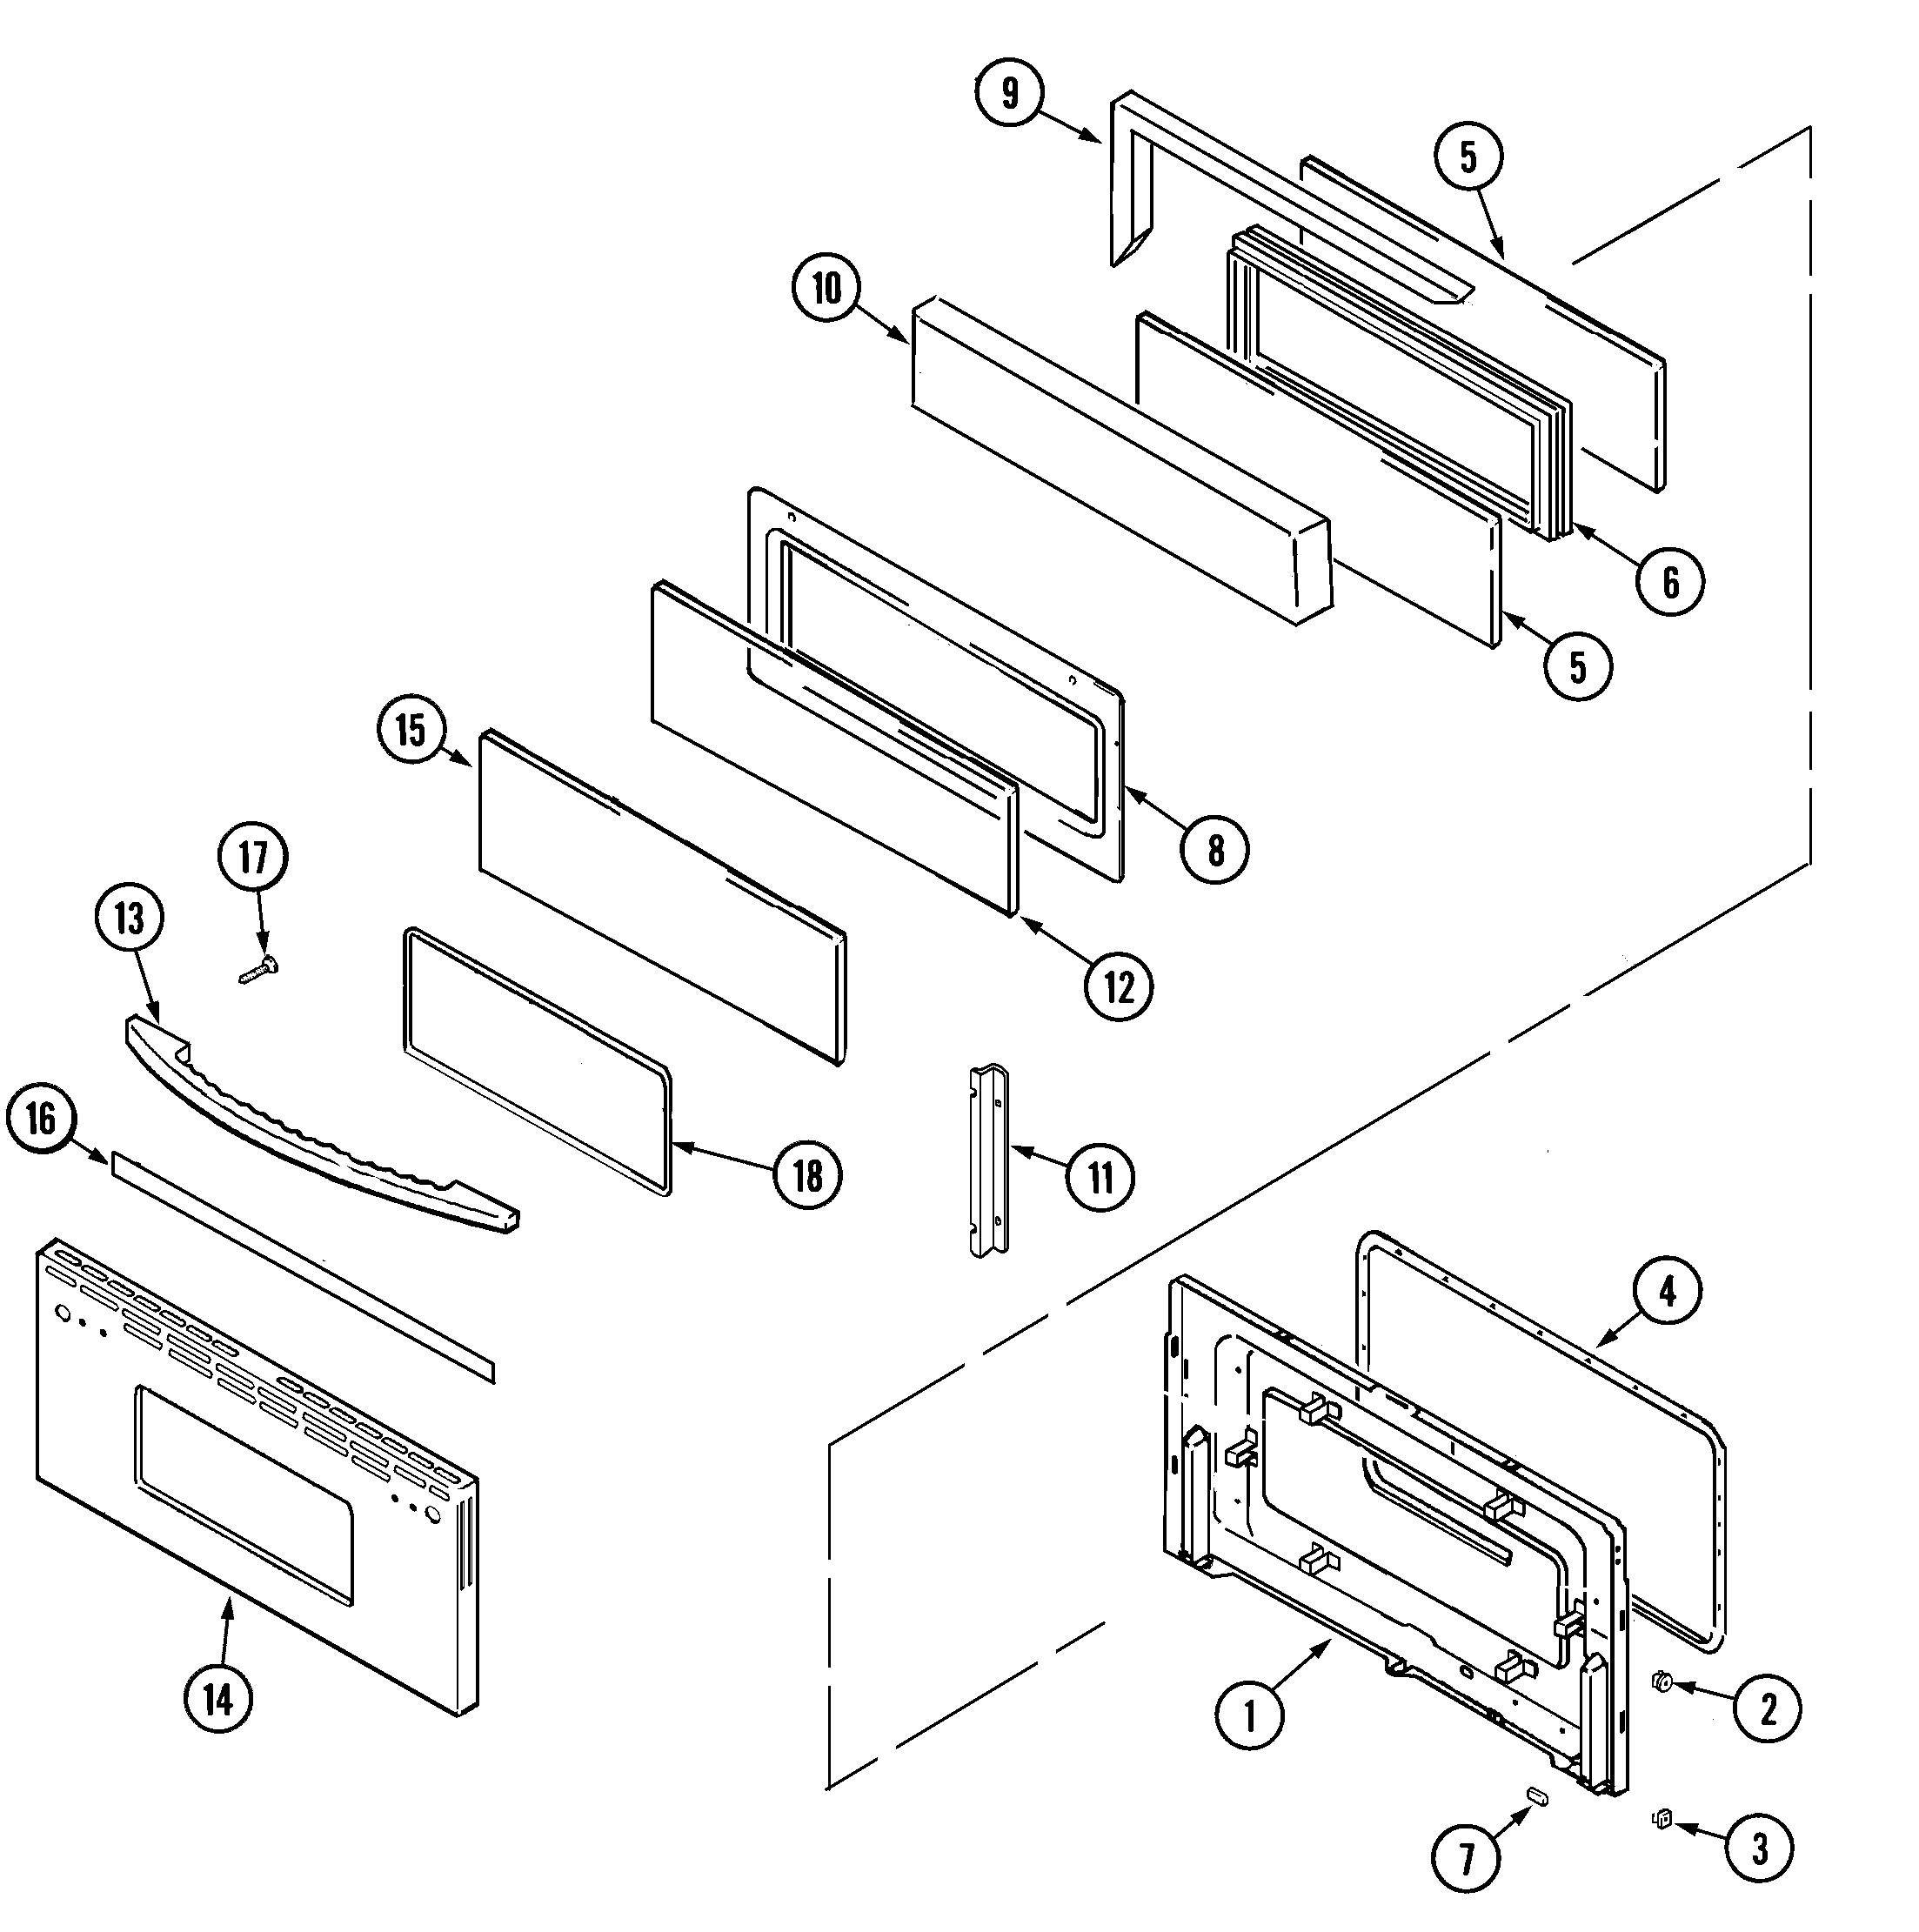 Dyson Dc15 Parts Diagram Agendadepaznarino Of Dyson Dc15 Parts Diagram